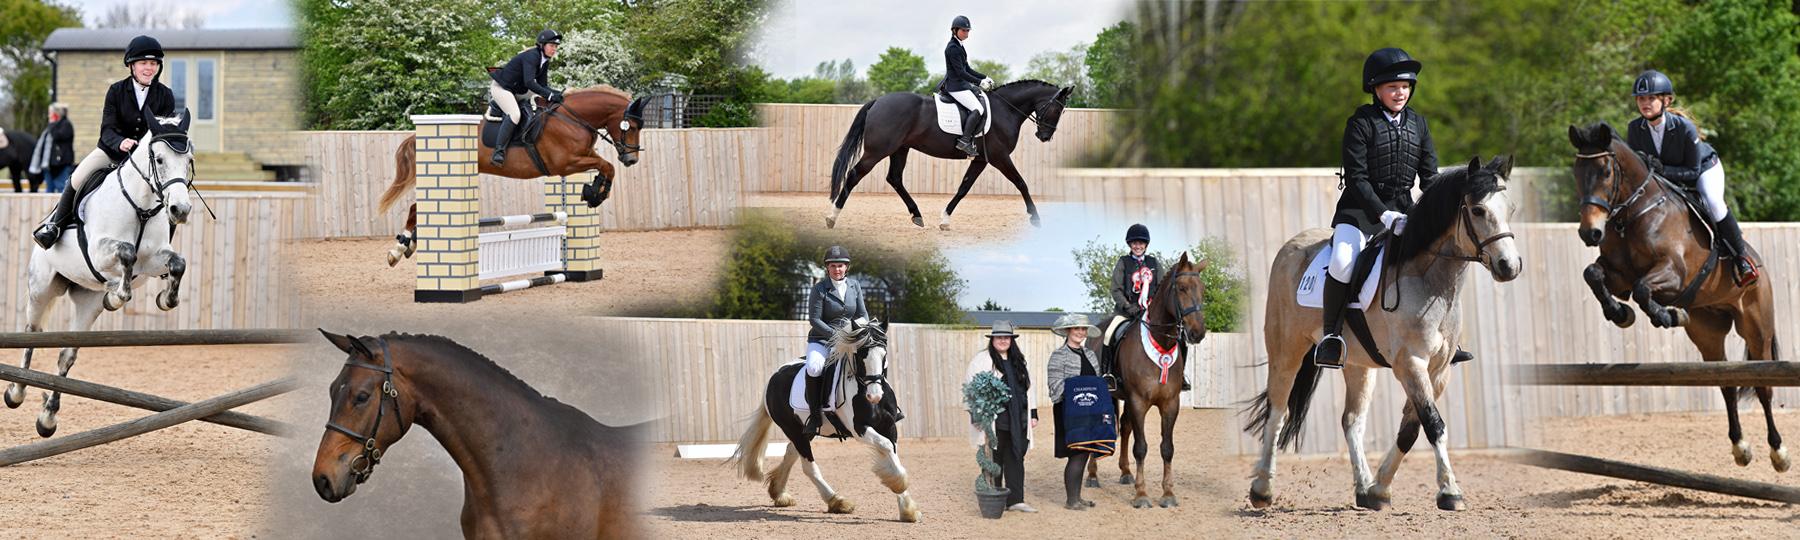 Equestrian Events at Harold's Park